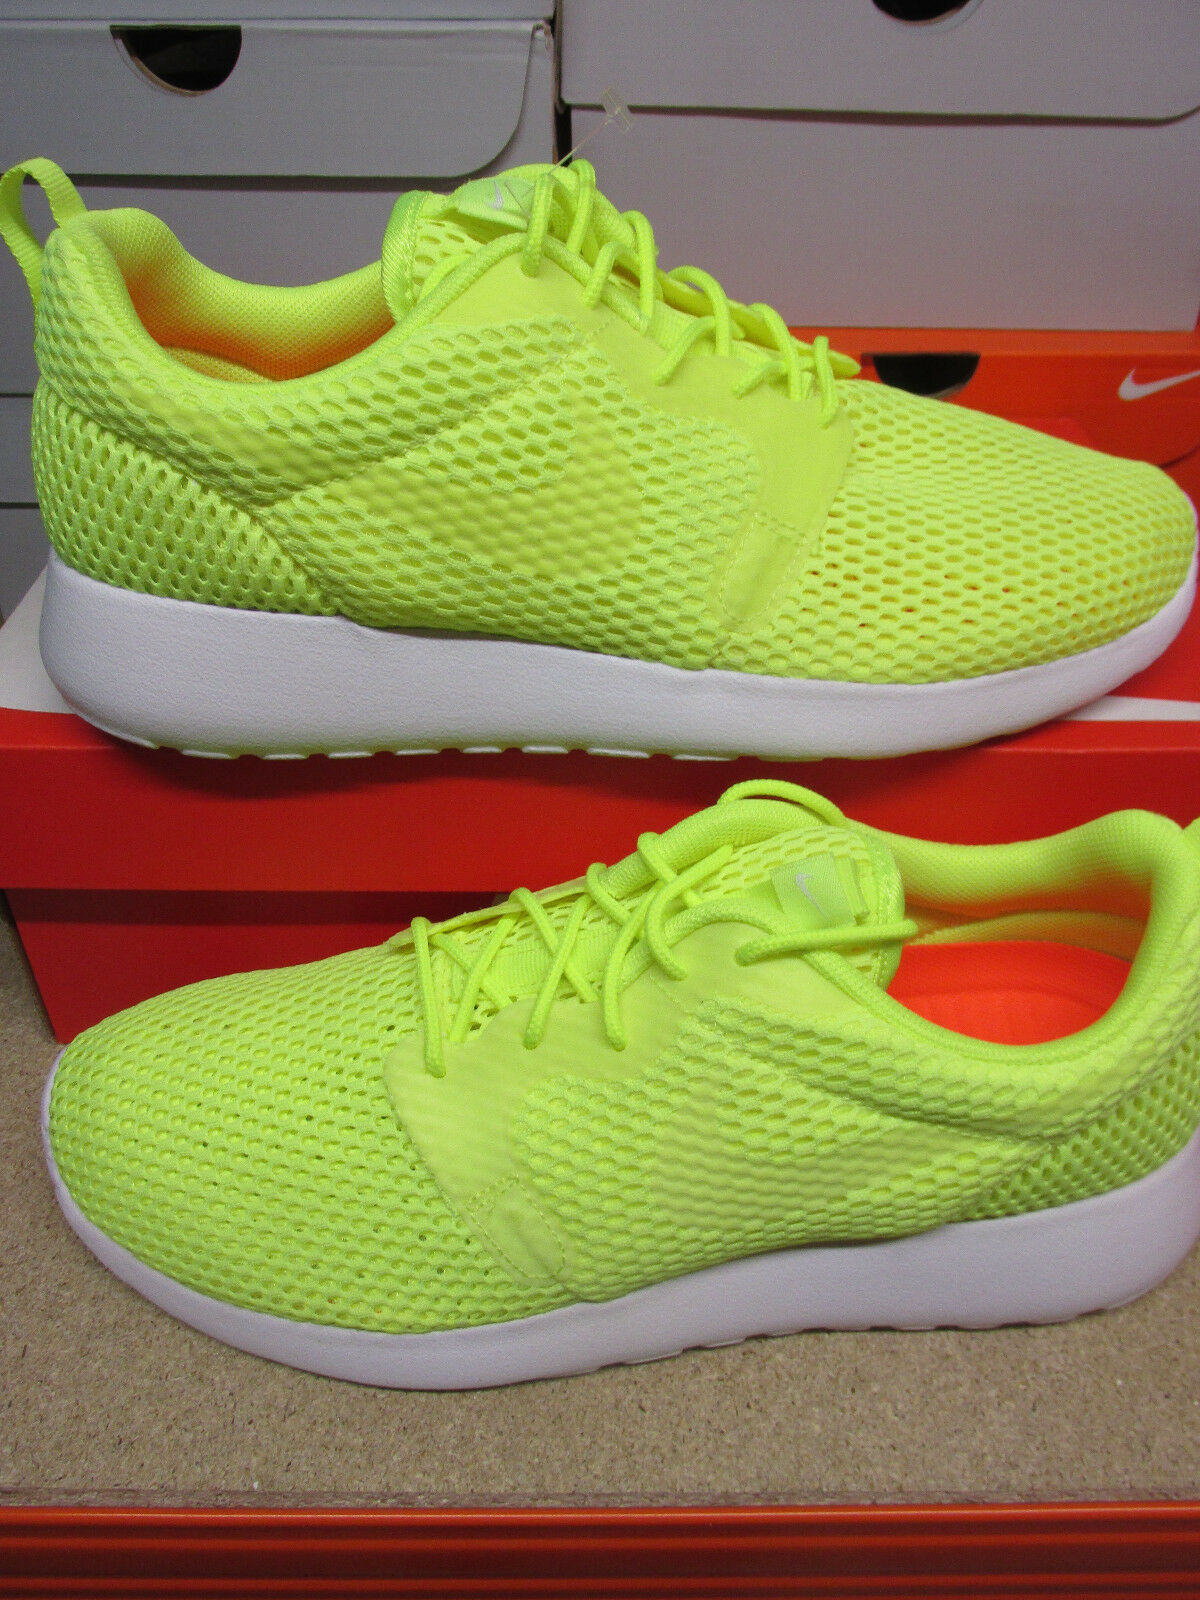 Nike roshe uno ipn br Uomo formatori 833125 700 700 700 scarpe, scarpe 463b5e